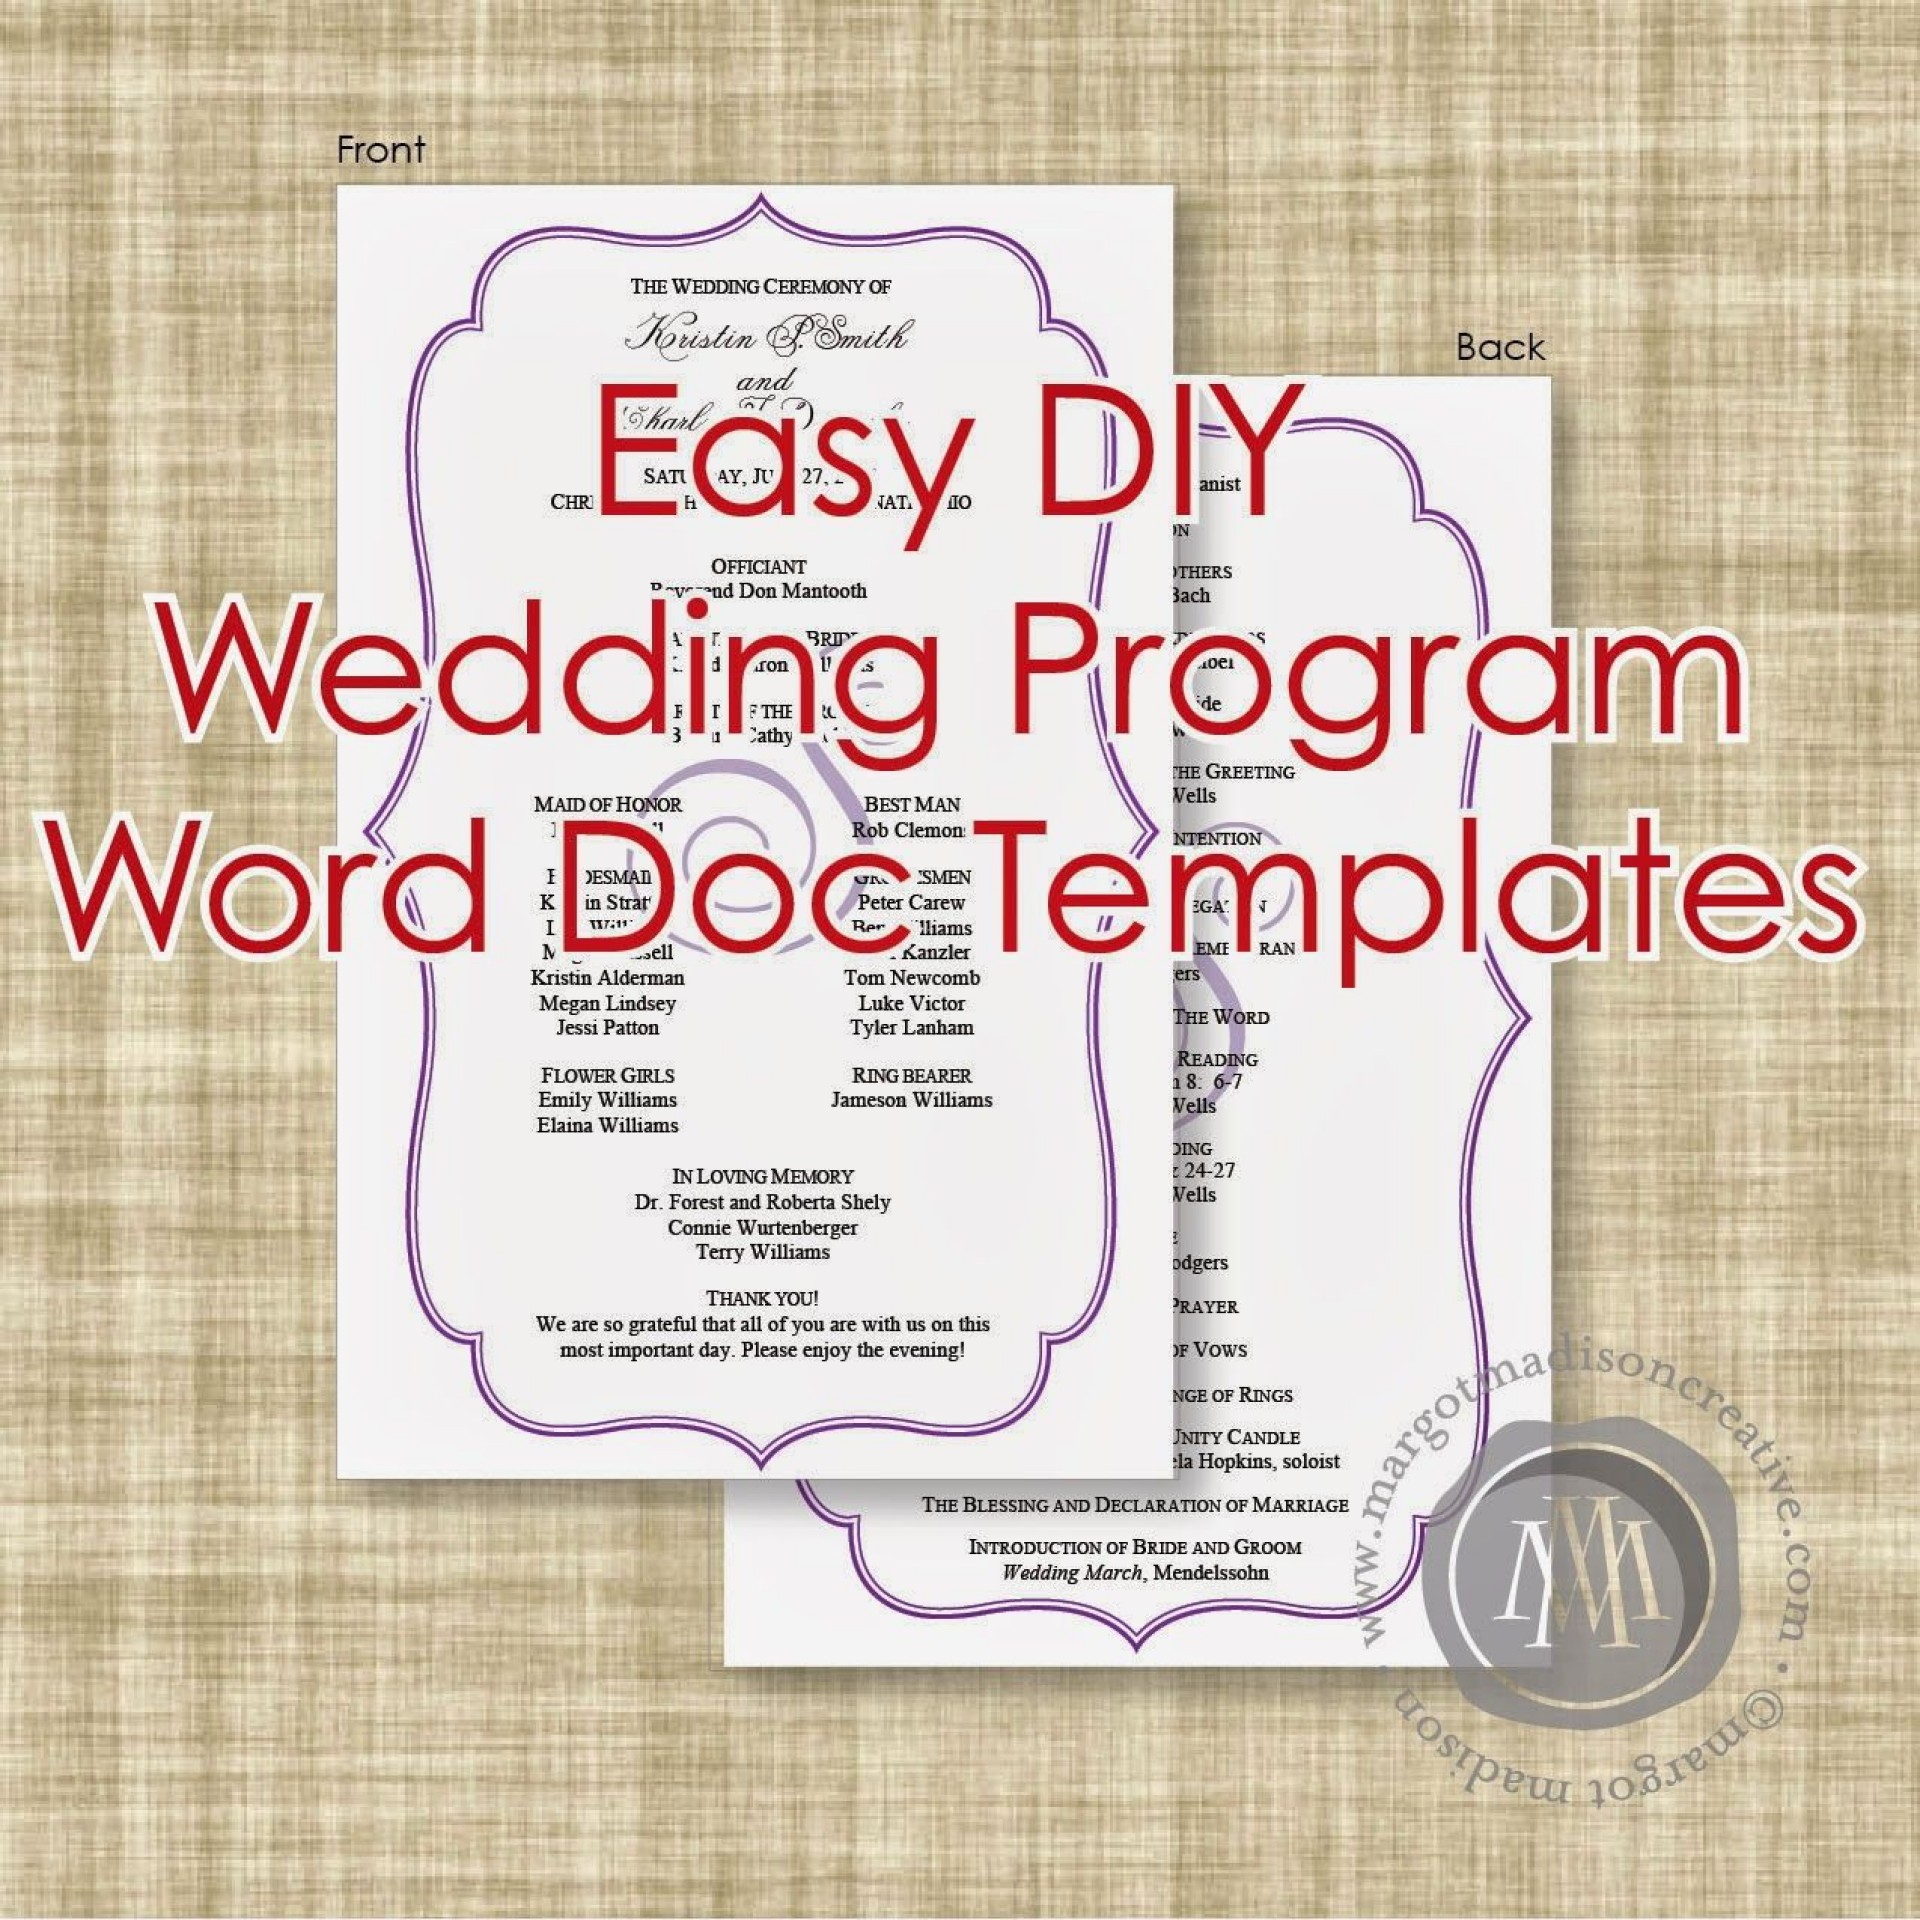 004 Imposing Wedding Program Template Word Picture  Catholic Mas Sample Wording Idea Example Simple1920